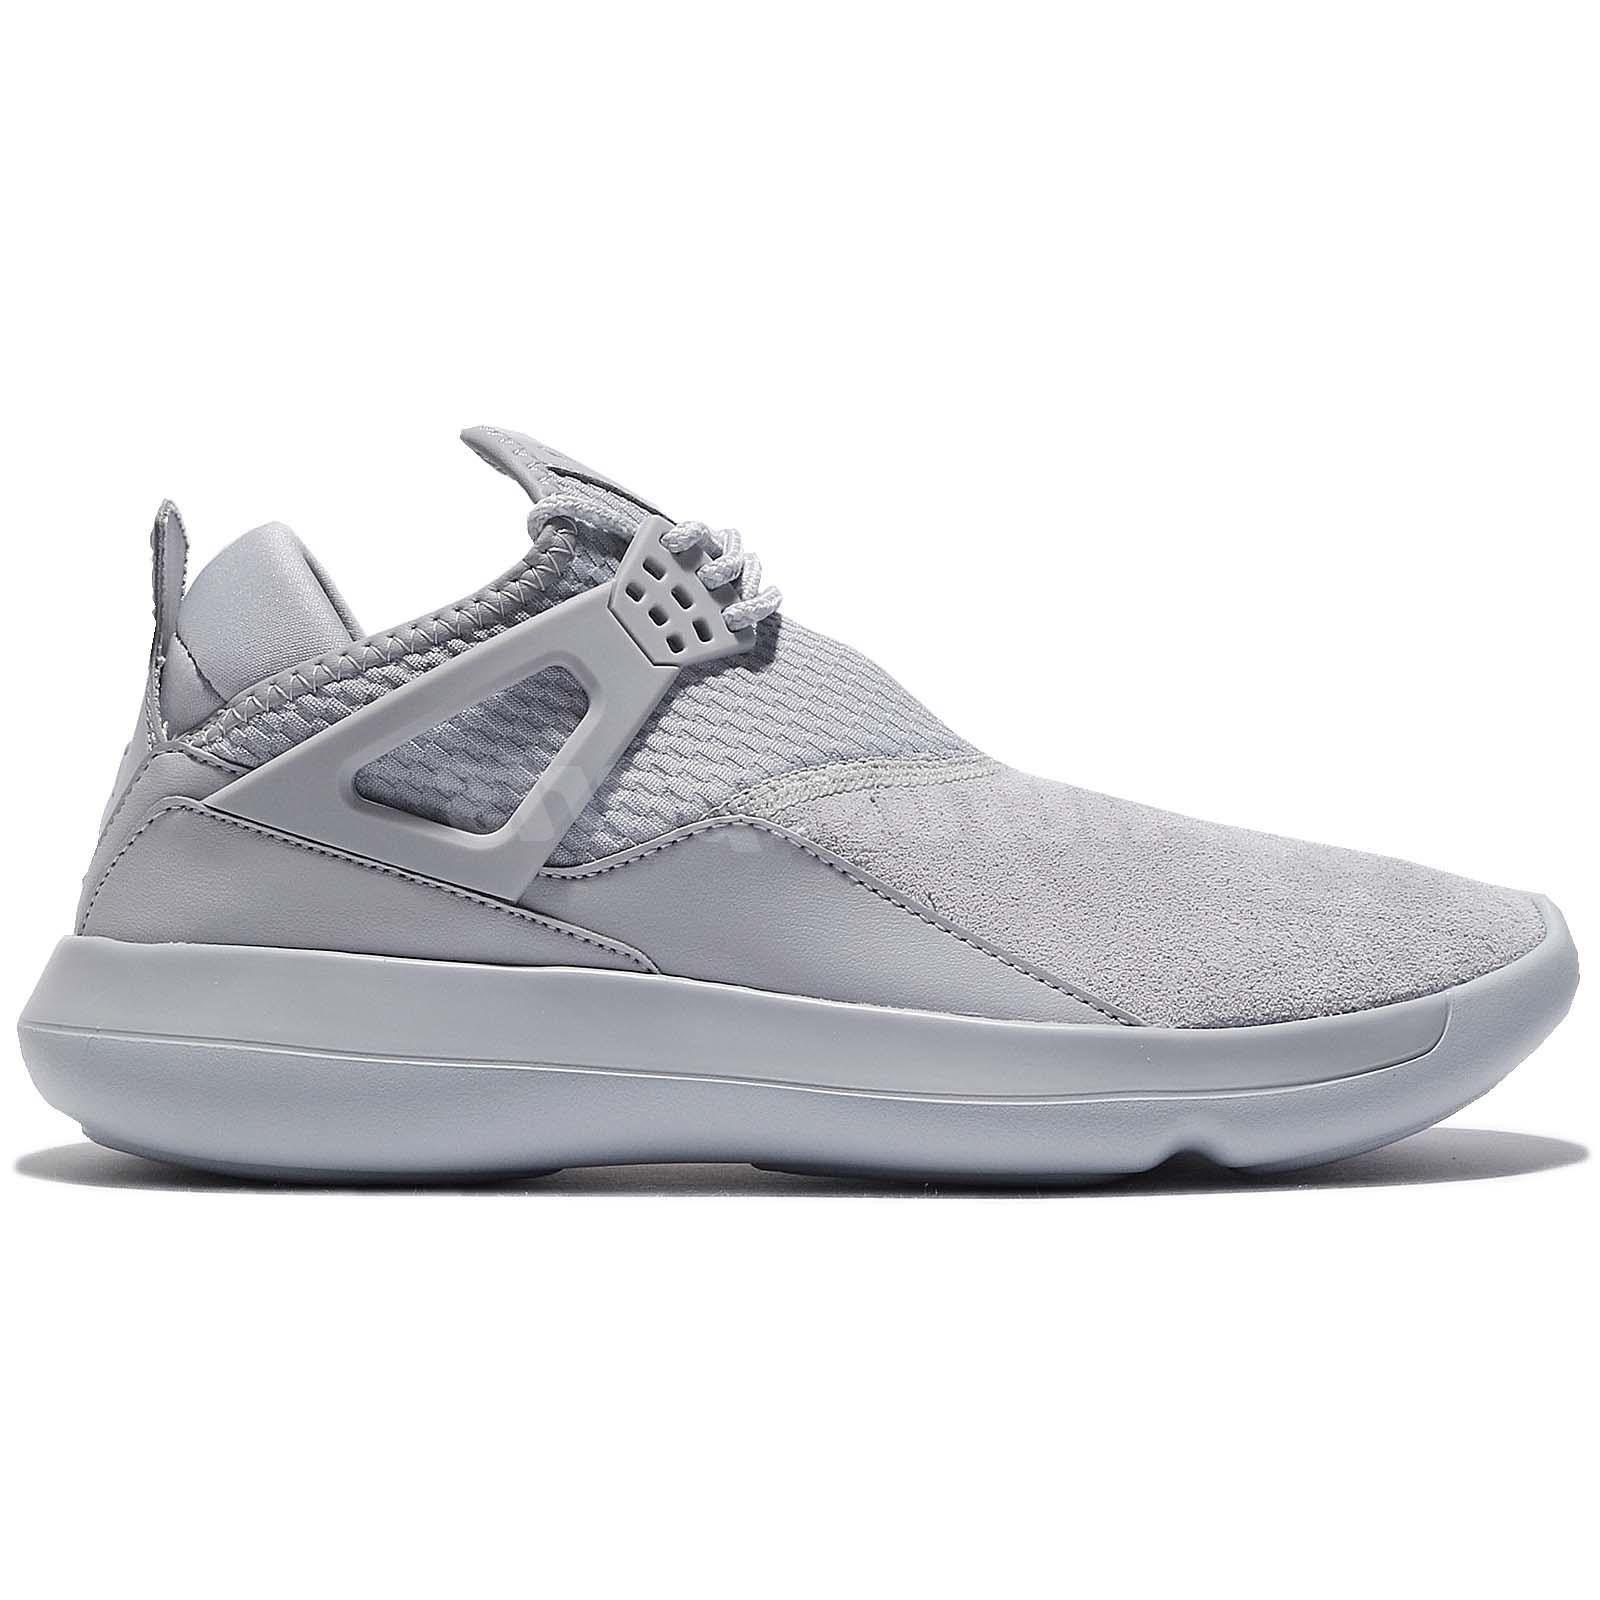 121f0132aefe Jordan Fly  89 Basketball Shoes